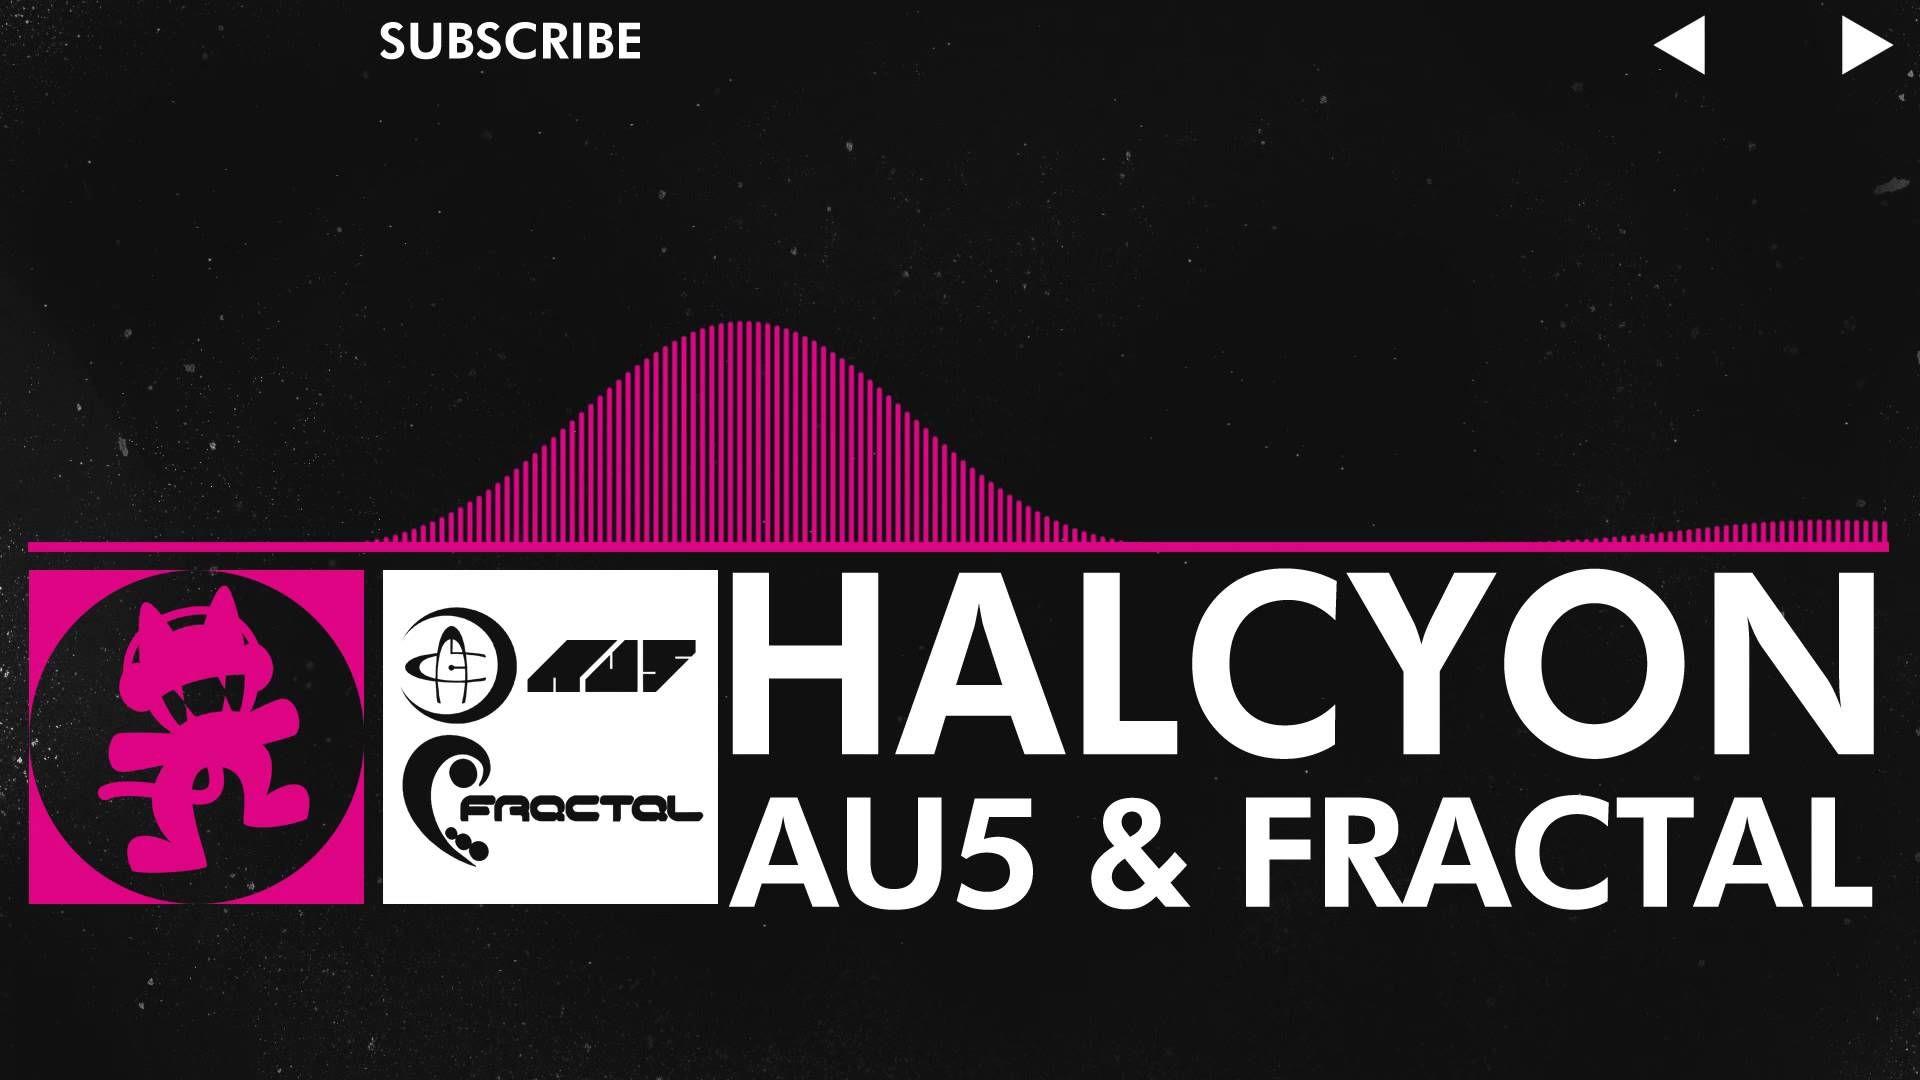 Drumstep] - Au5 & Fractal - Halcyon [Monstercat Release